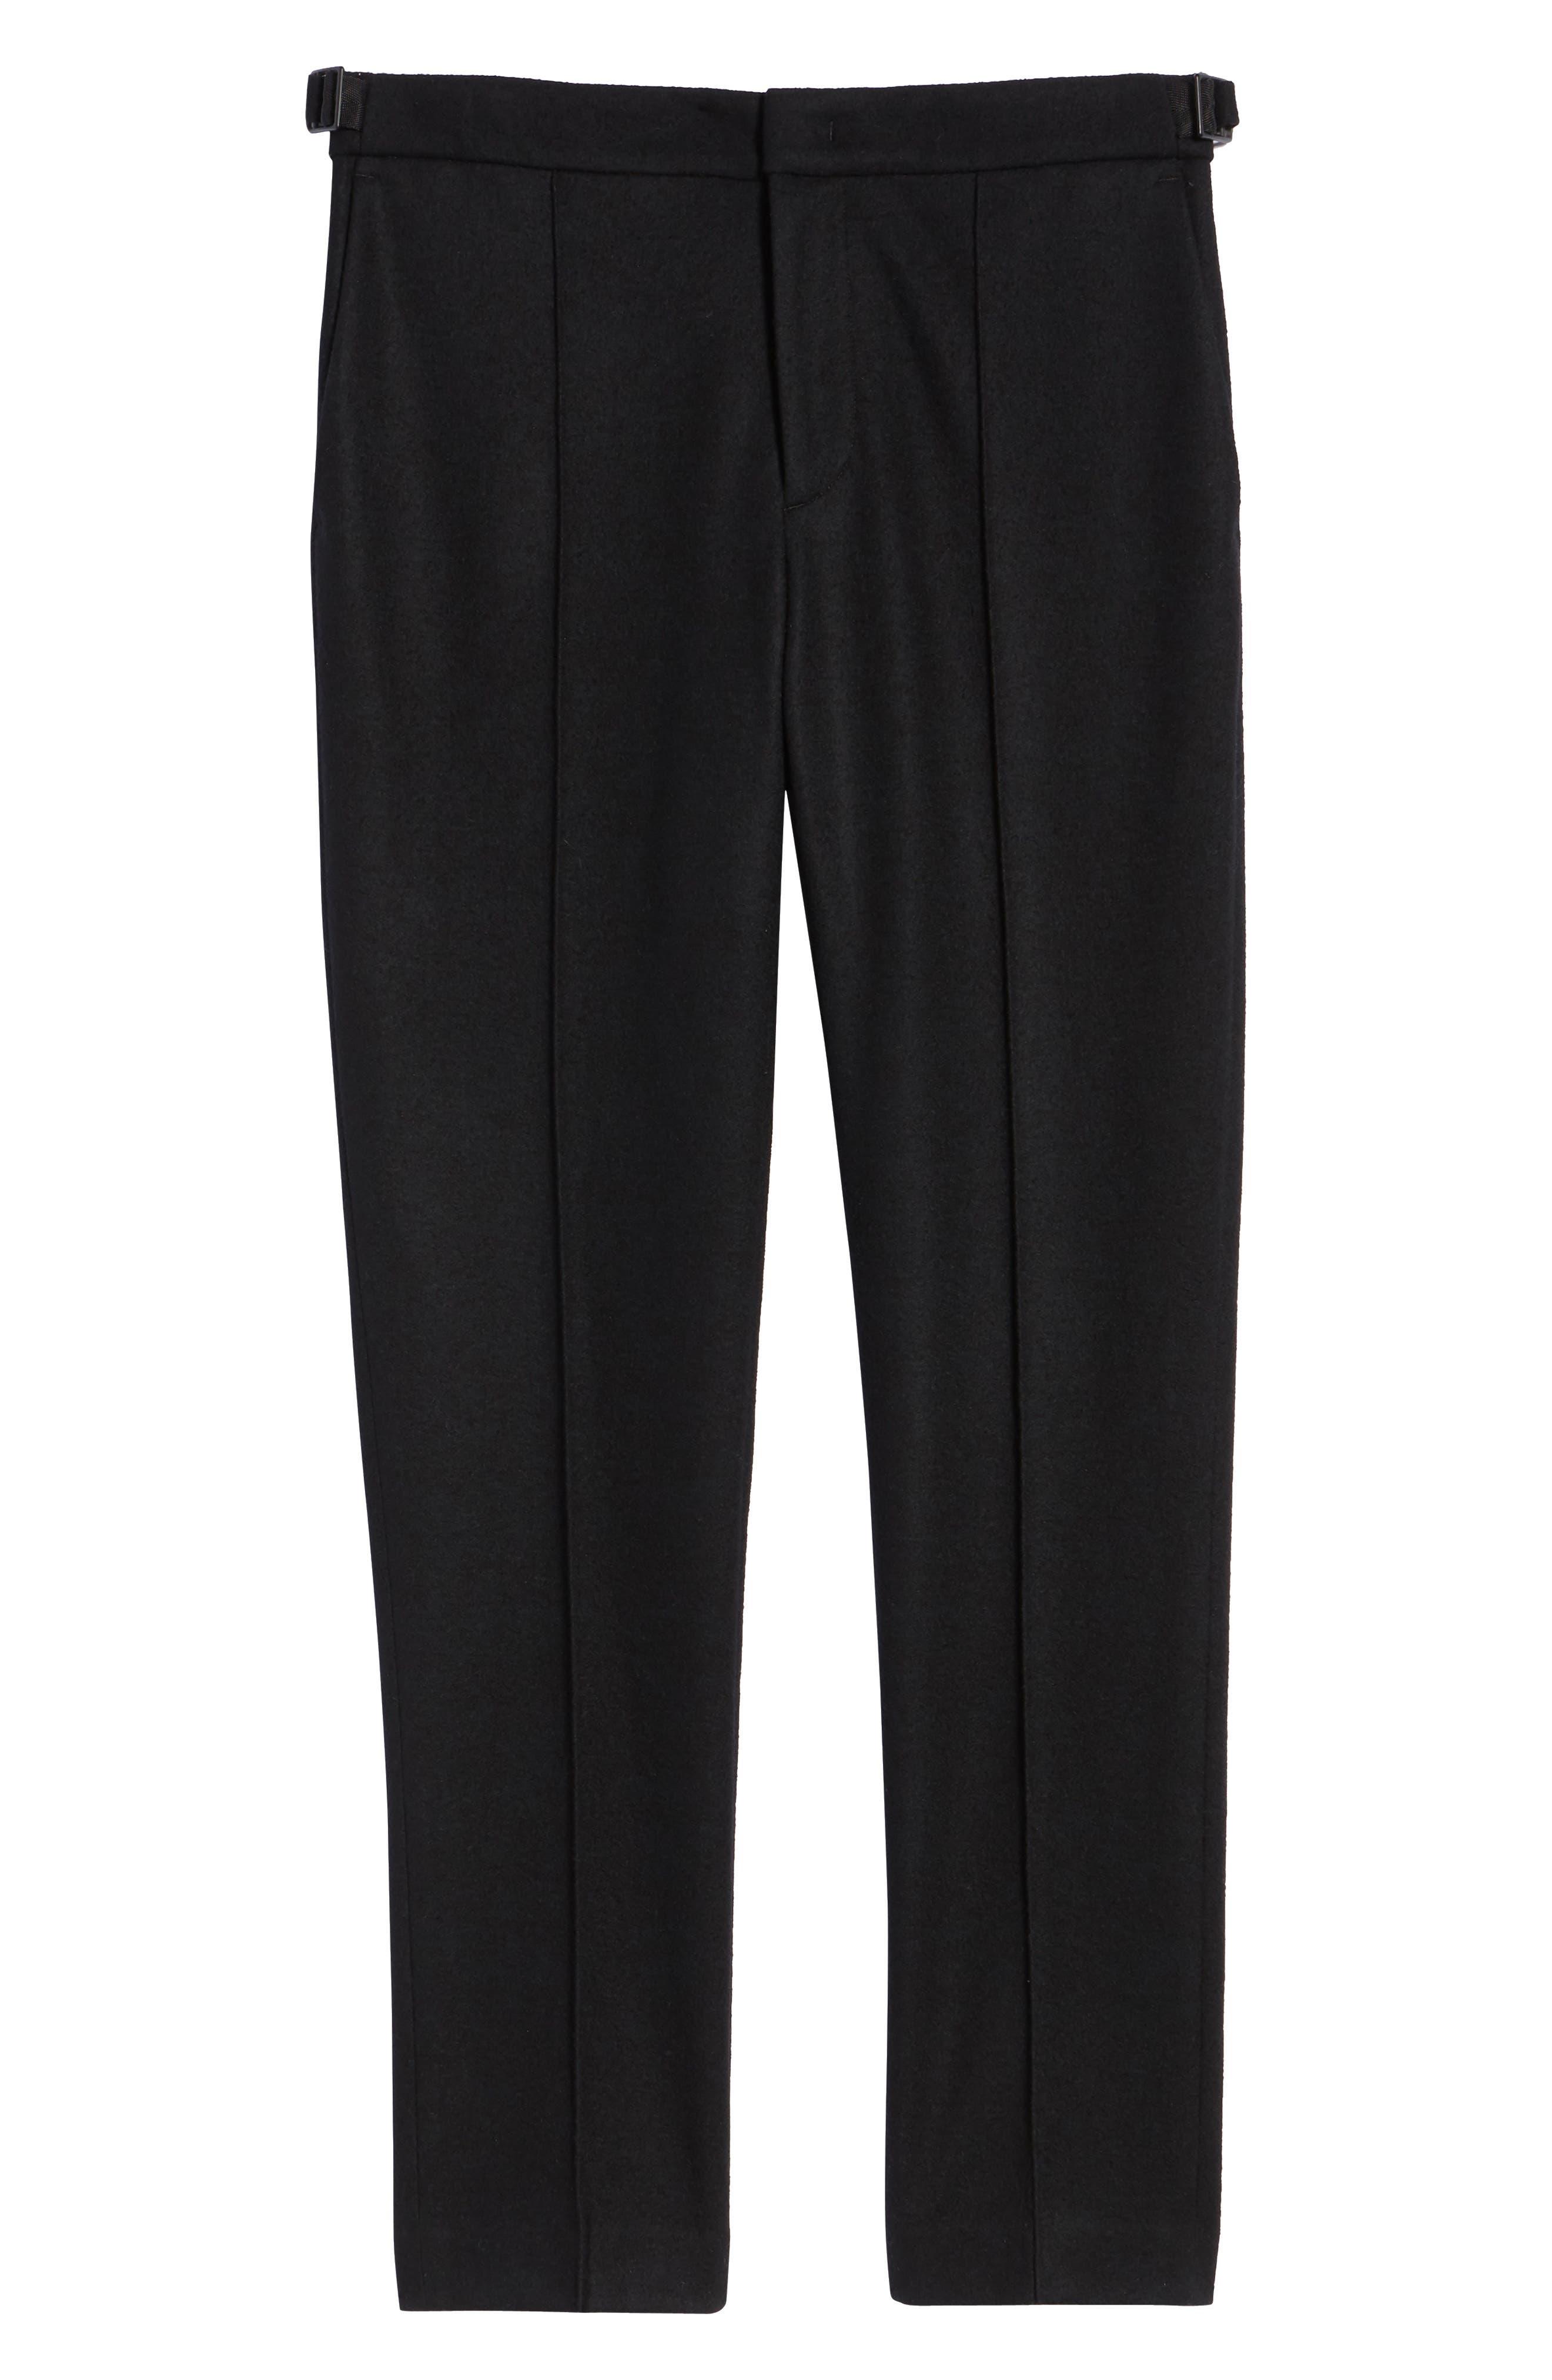 Sector Slim Fit Wool Jersey Pants,                             Alternate thumbnail 6, color,                             BLACK